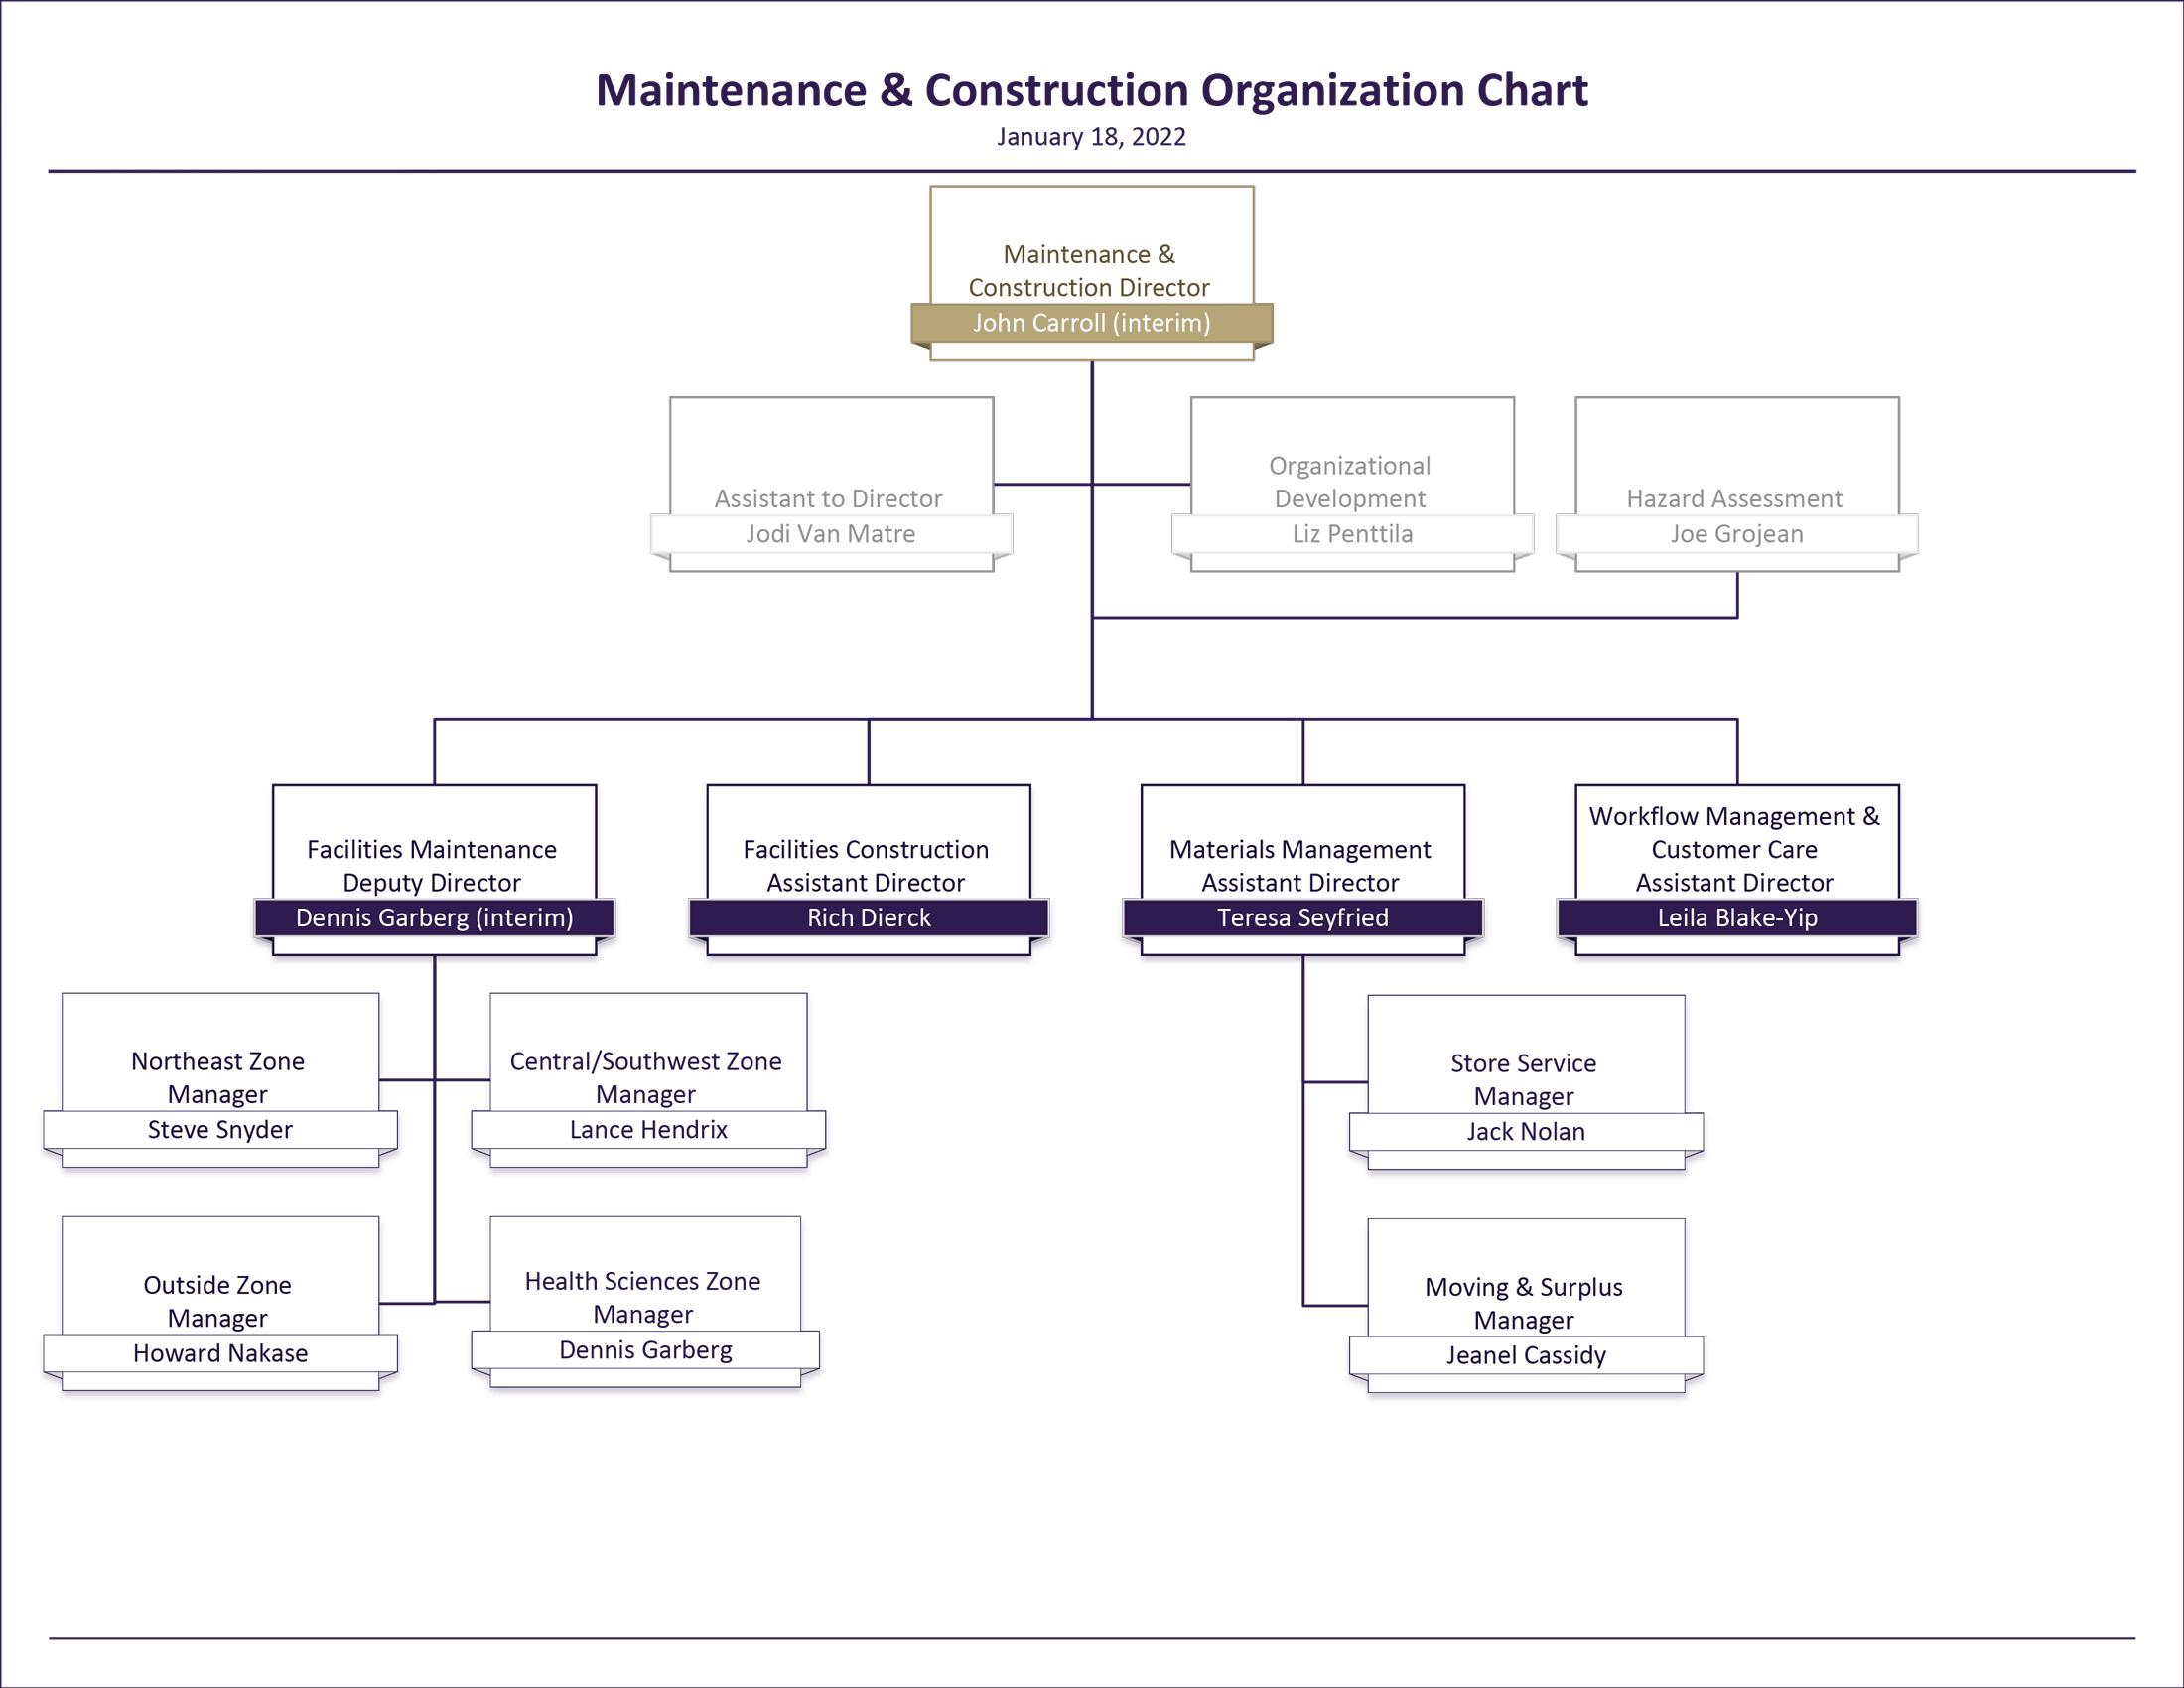 Maintenance and Construction organization chart